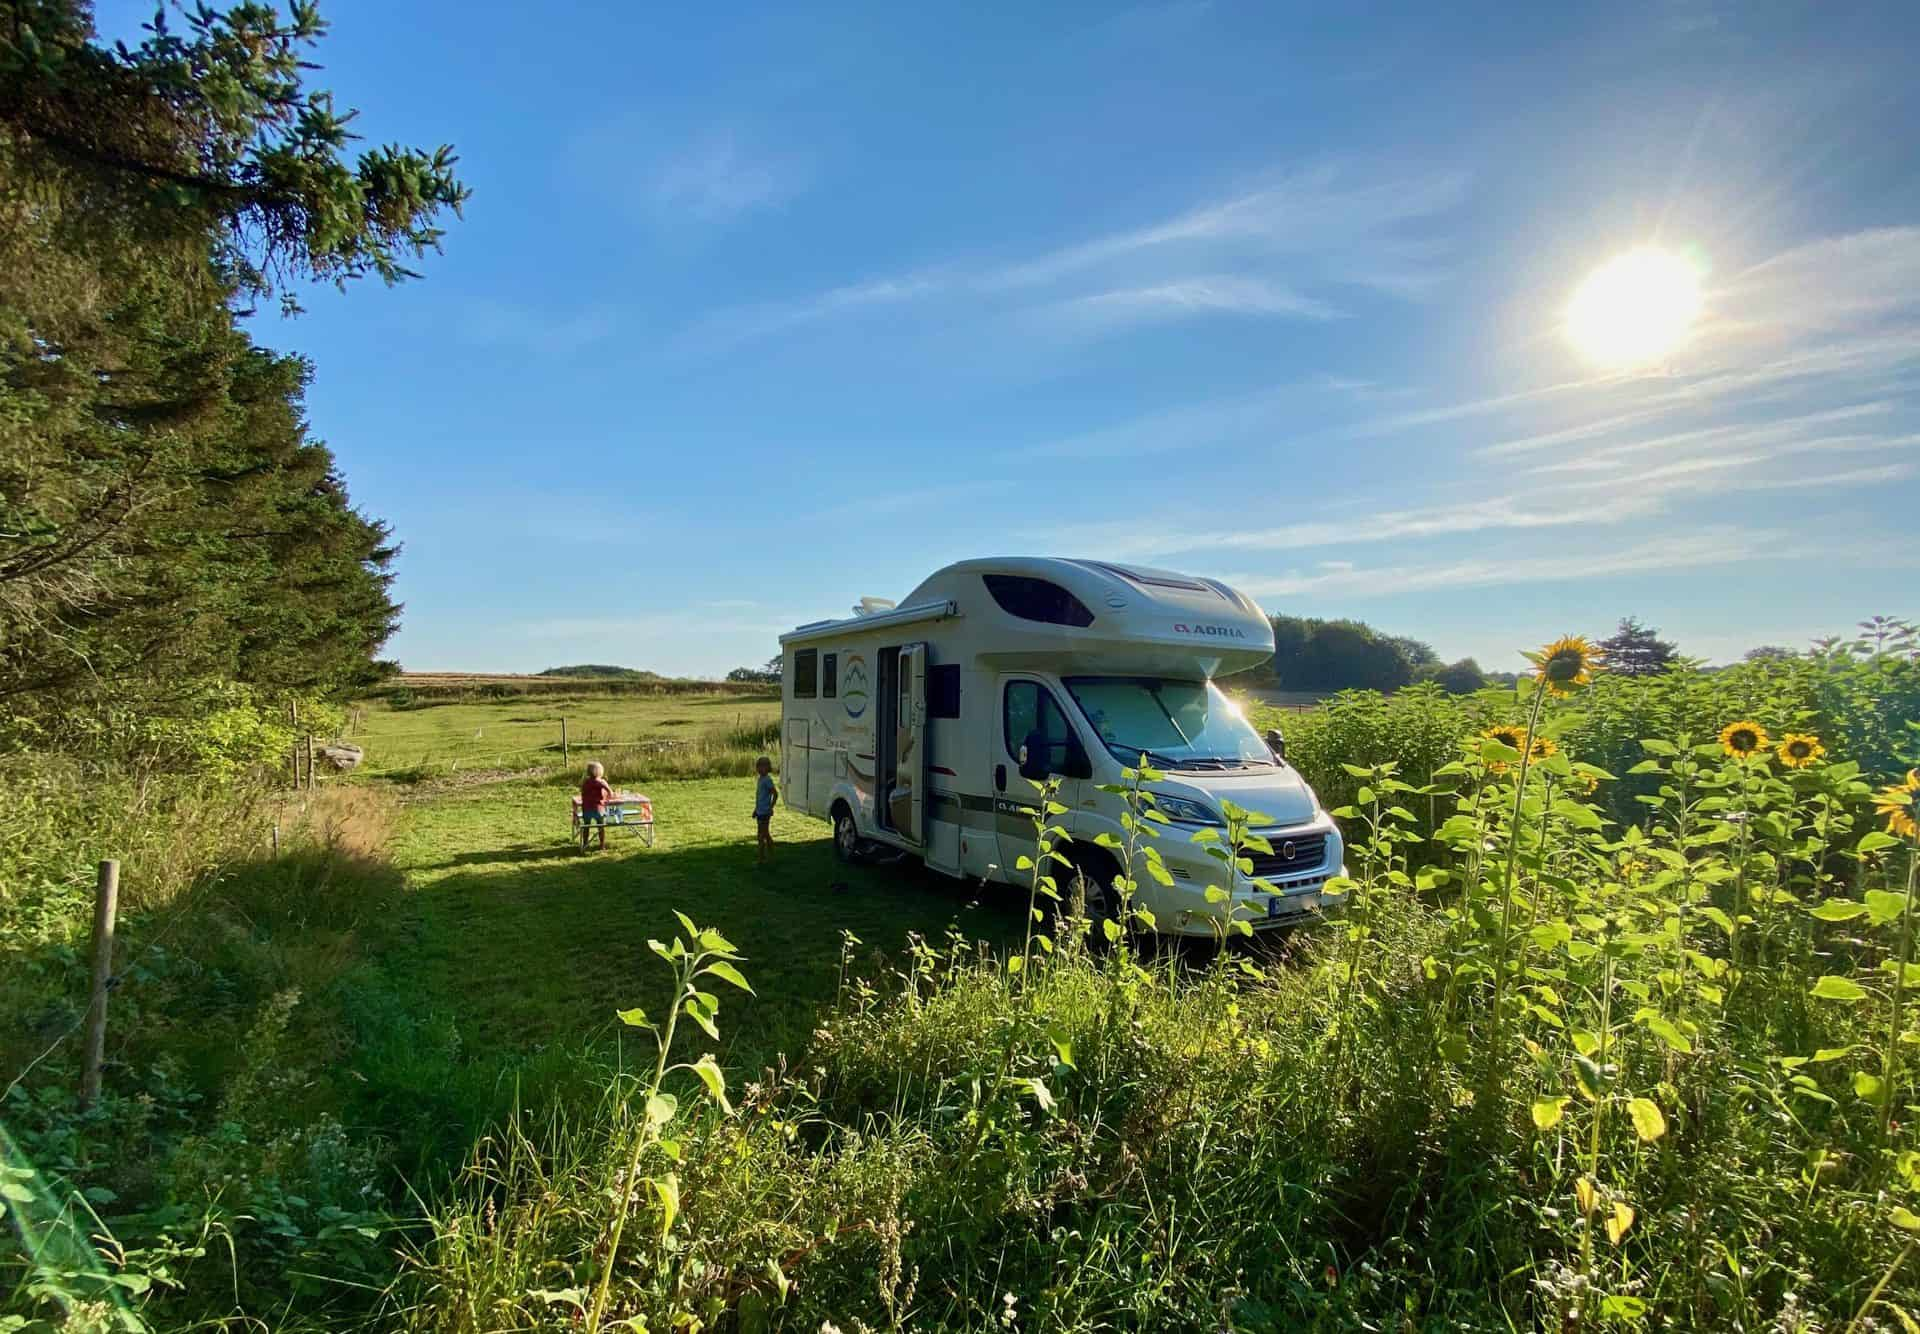 Reise-Wohnmobil-Daenemark-Pintrip-Sondergaard-Wohnmobil-Frühstück-Sonnenblumenfeld